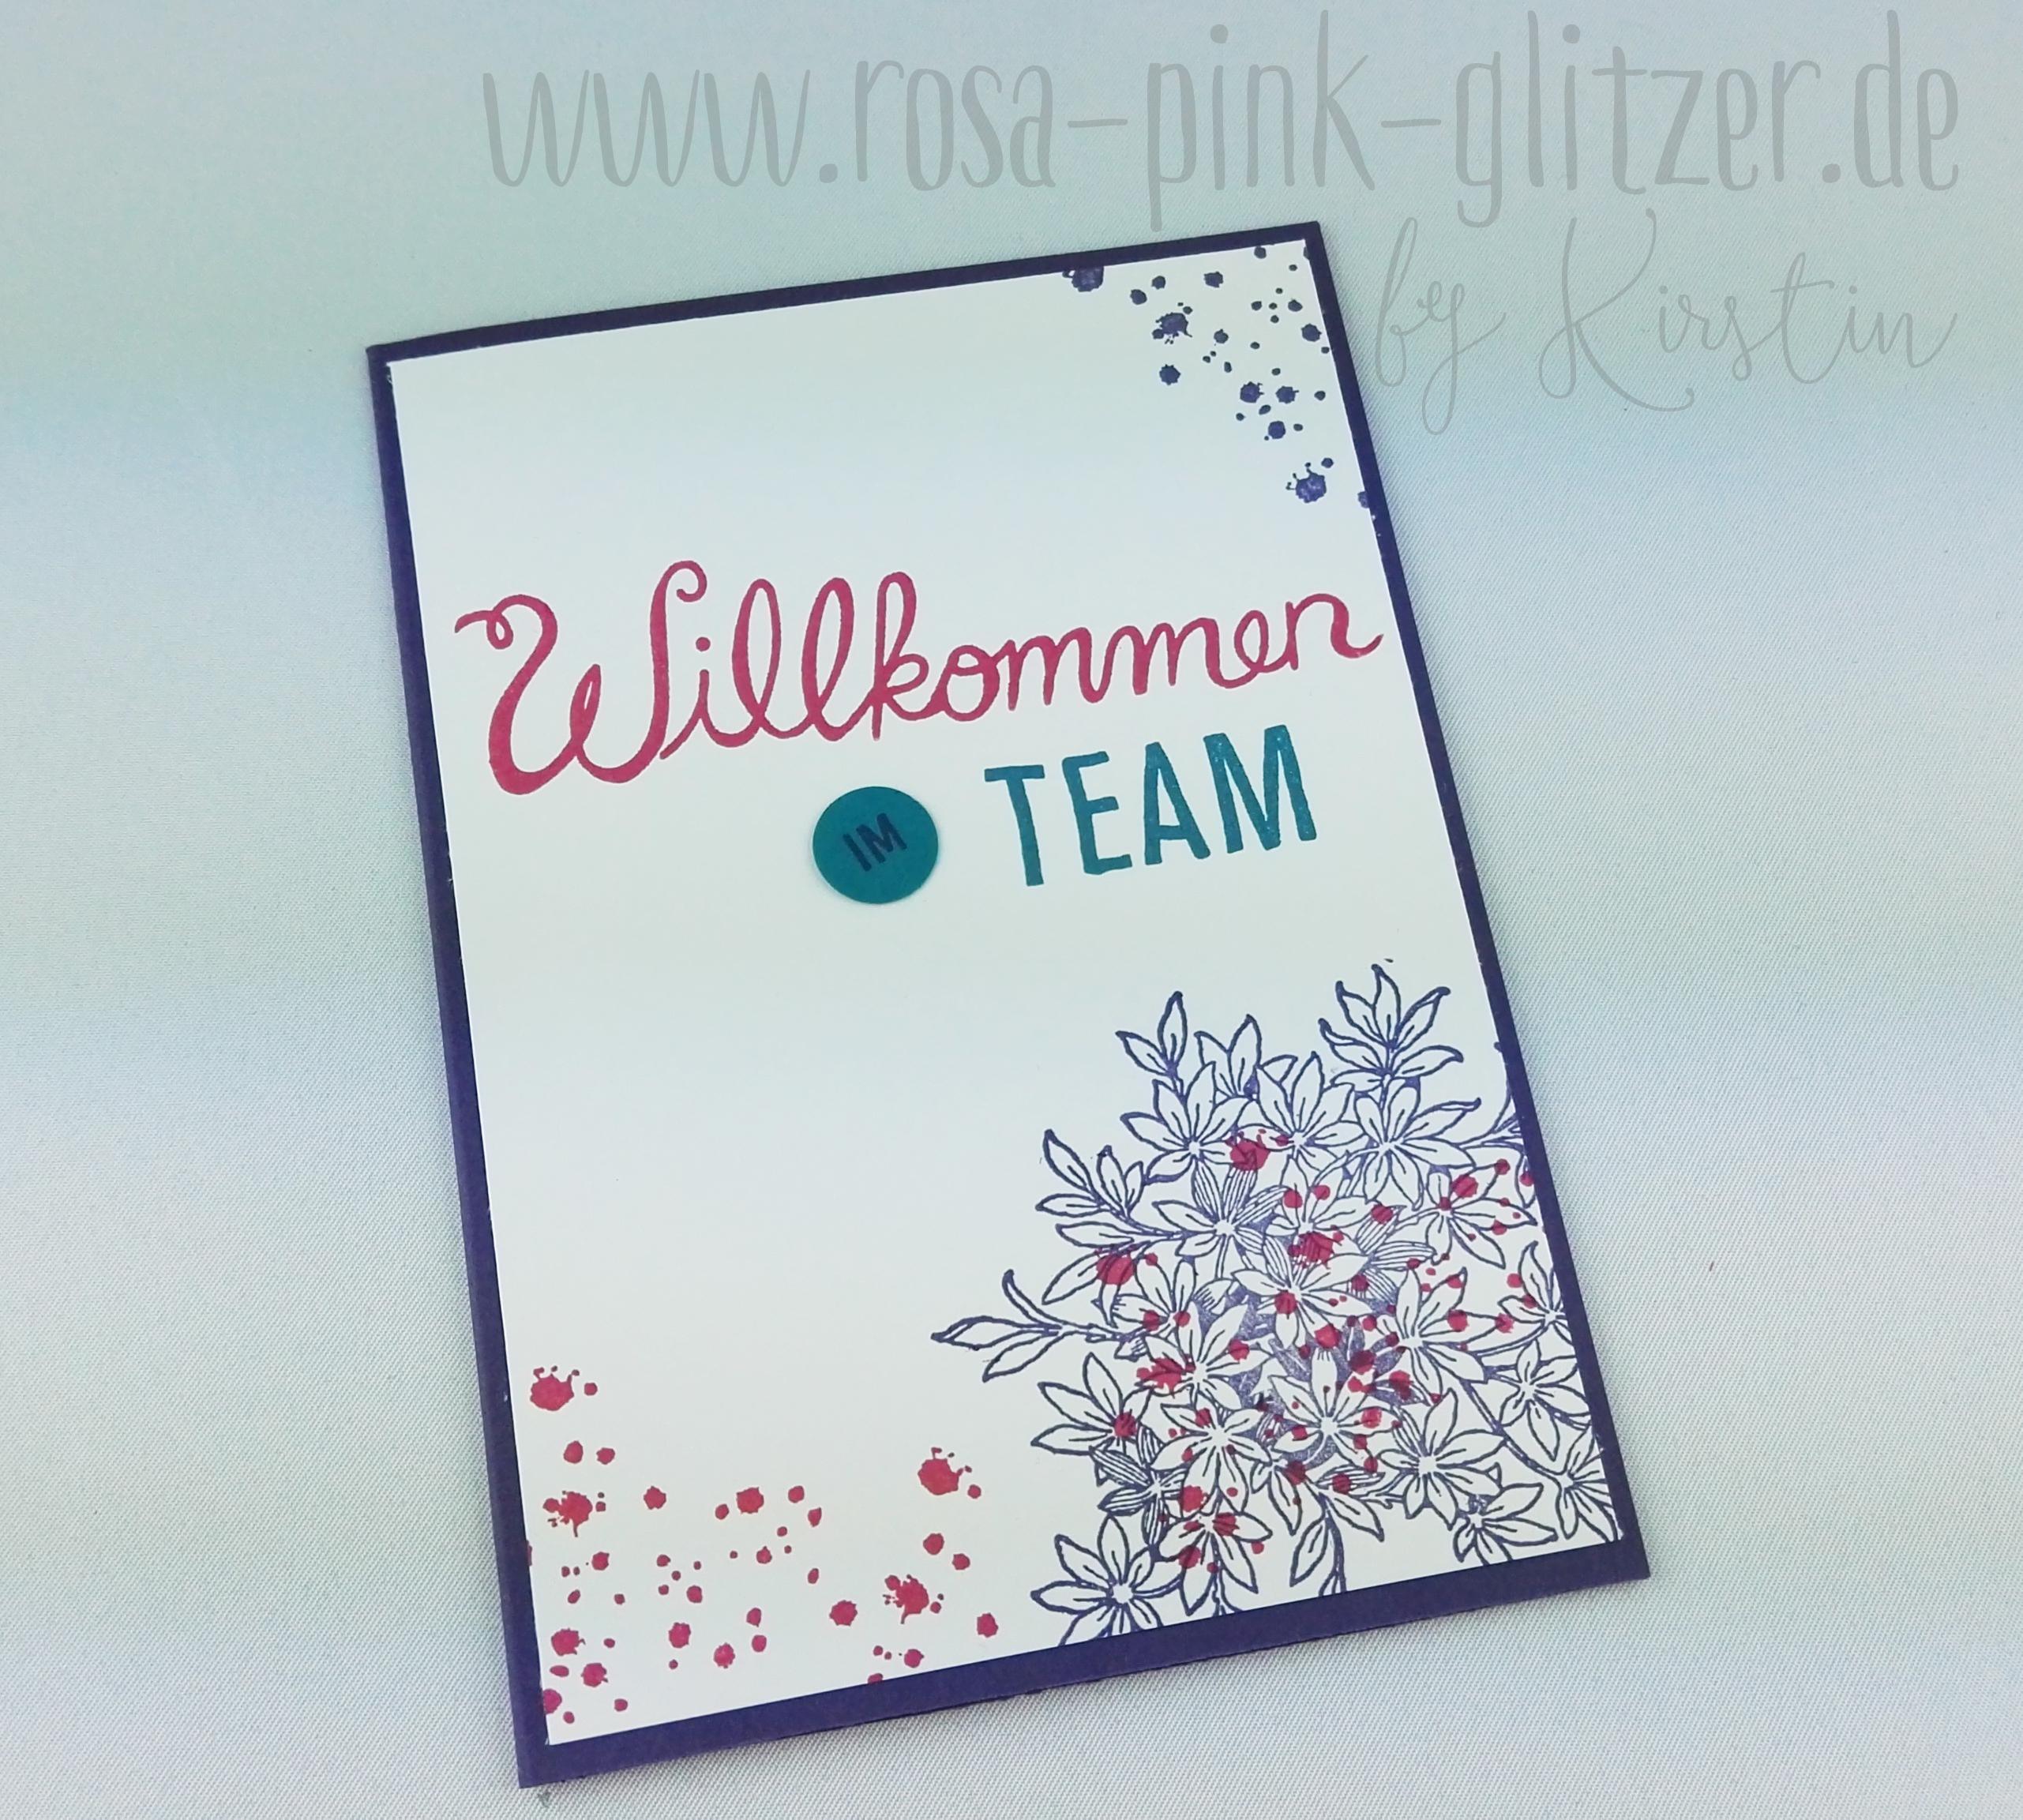 stampin-up-landshut-willkommen-im-team-awesomely-artistic-4